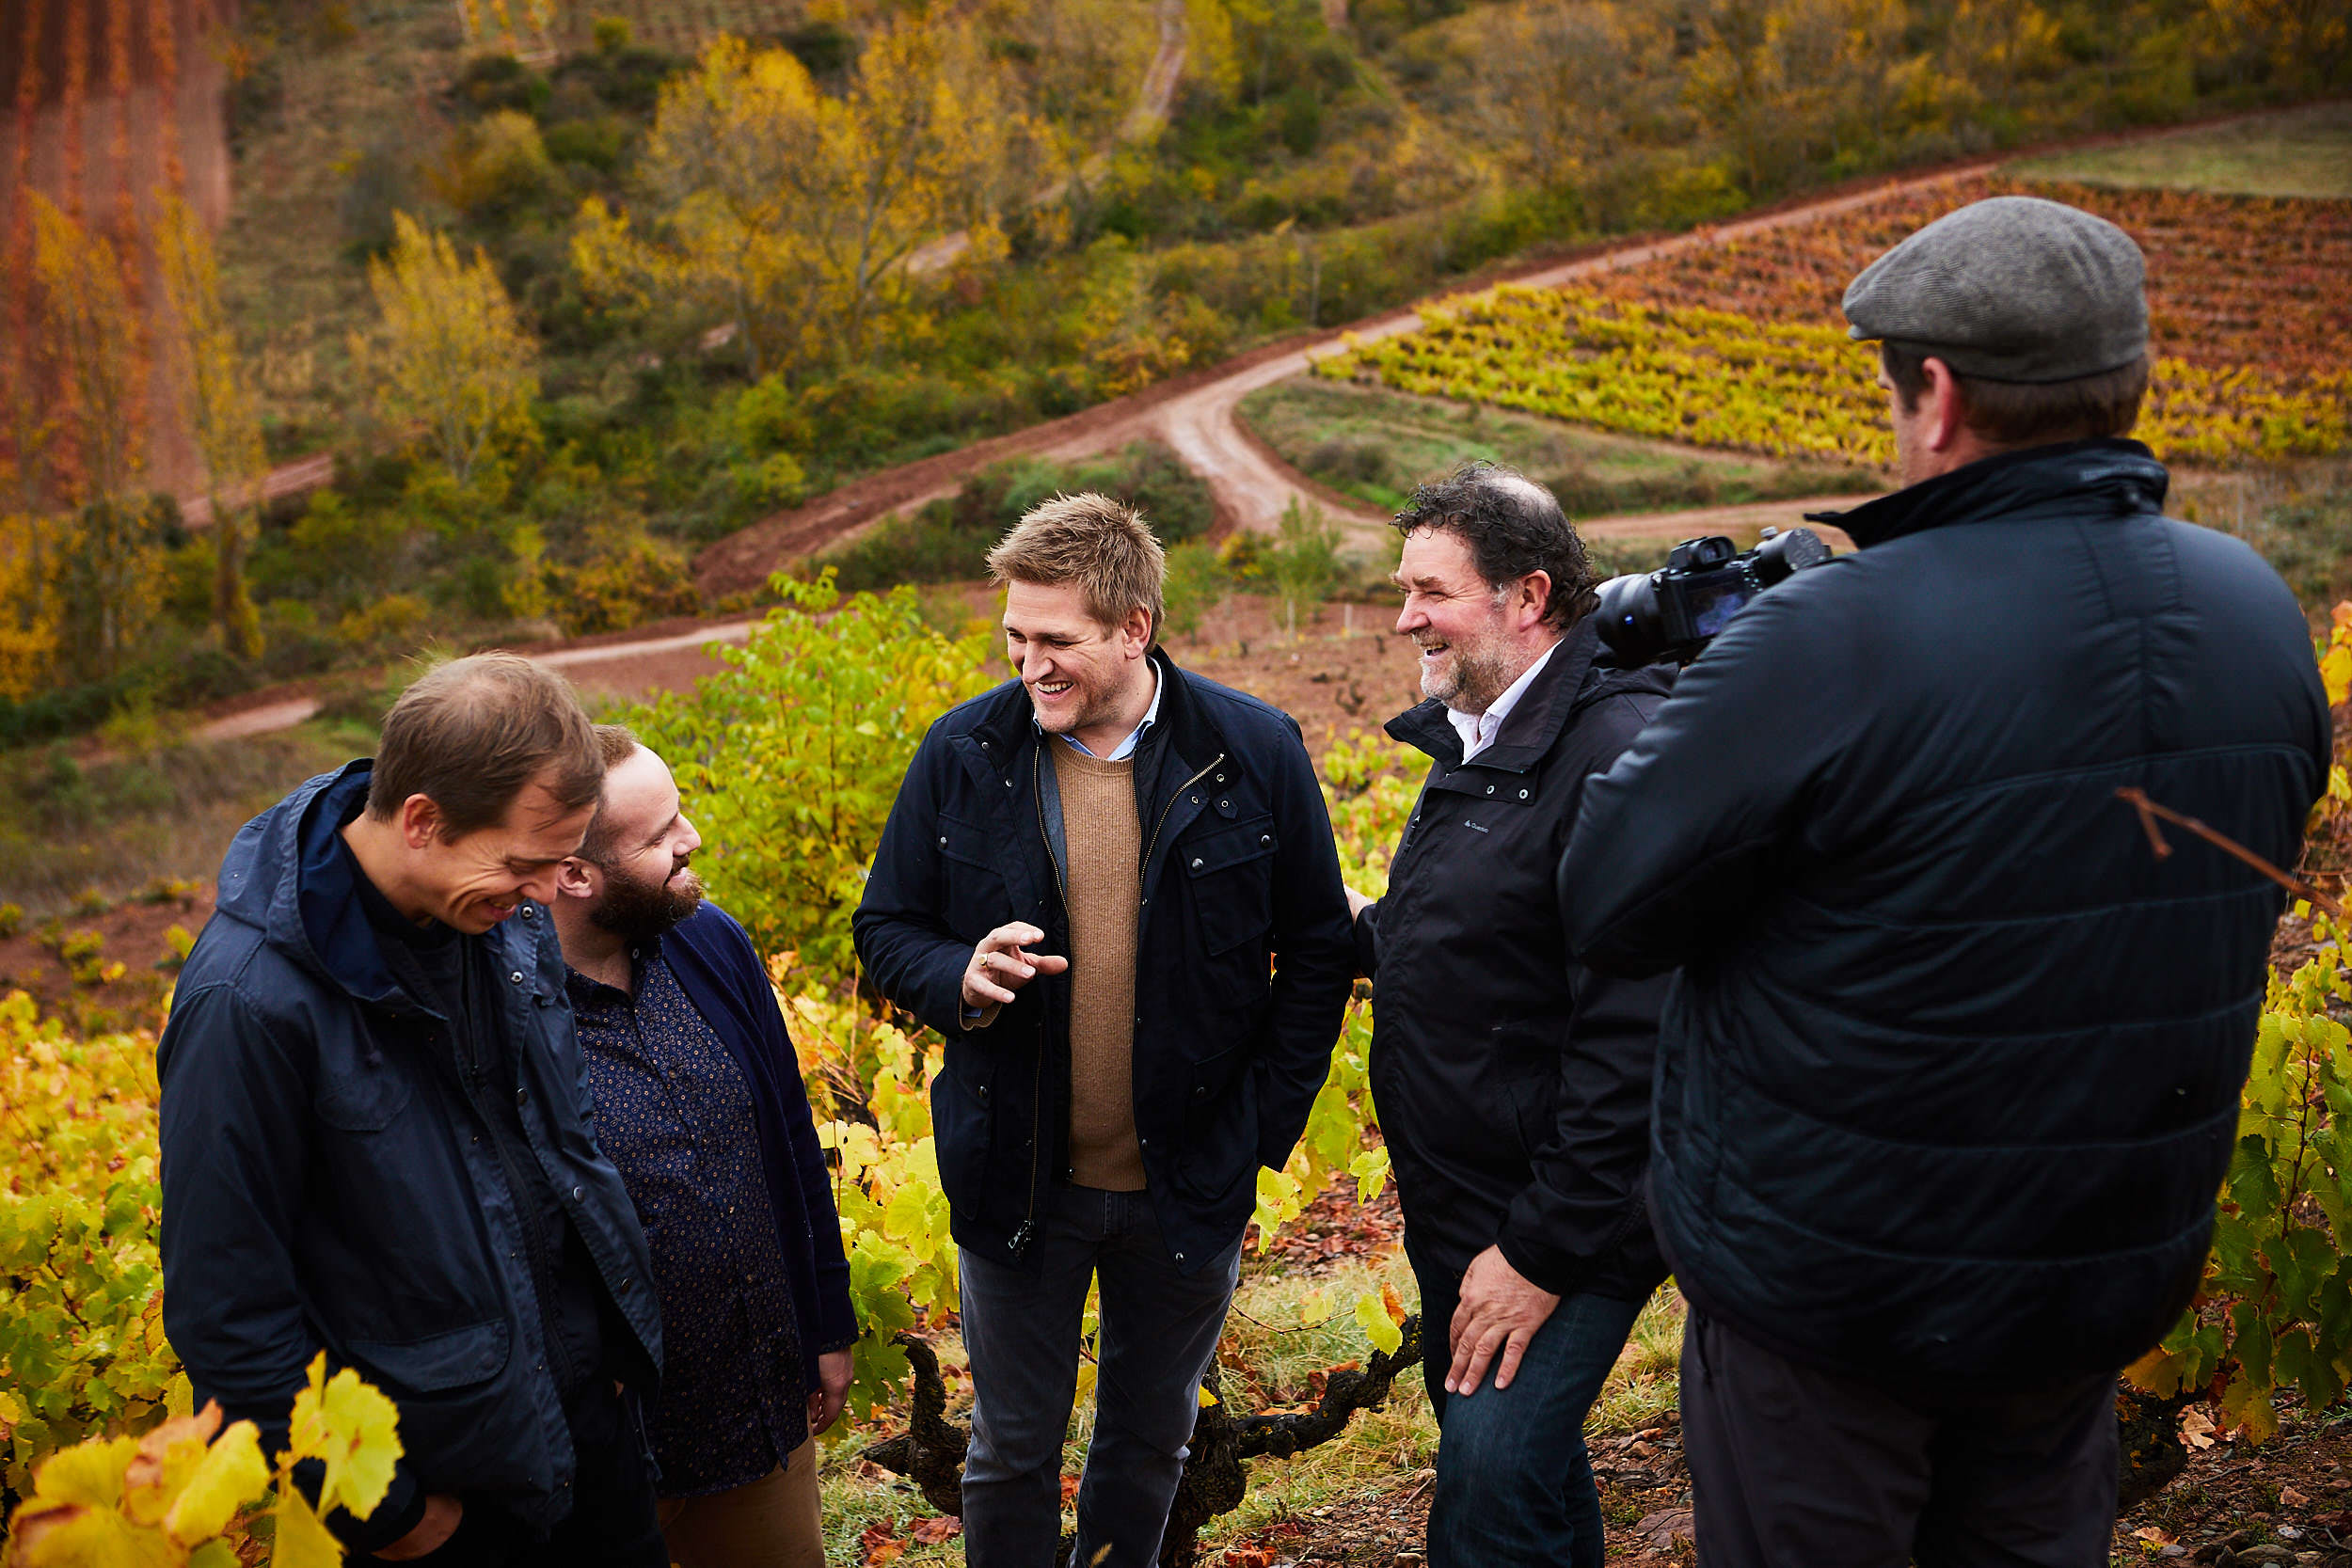 Professional_photographer_La_Rioja_Basque_Country_Spain_Chef_Curtis_Stone_Sturcke_008.jpg